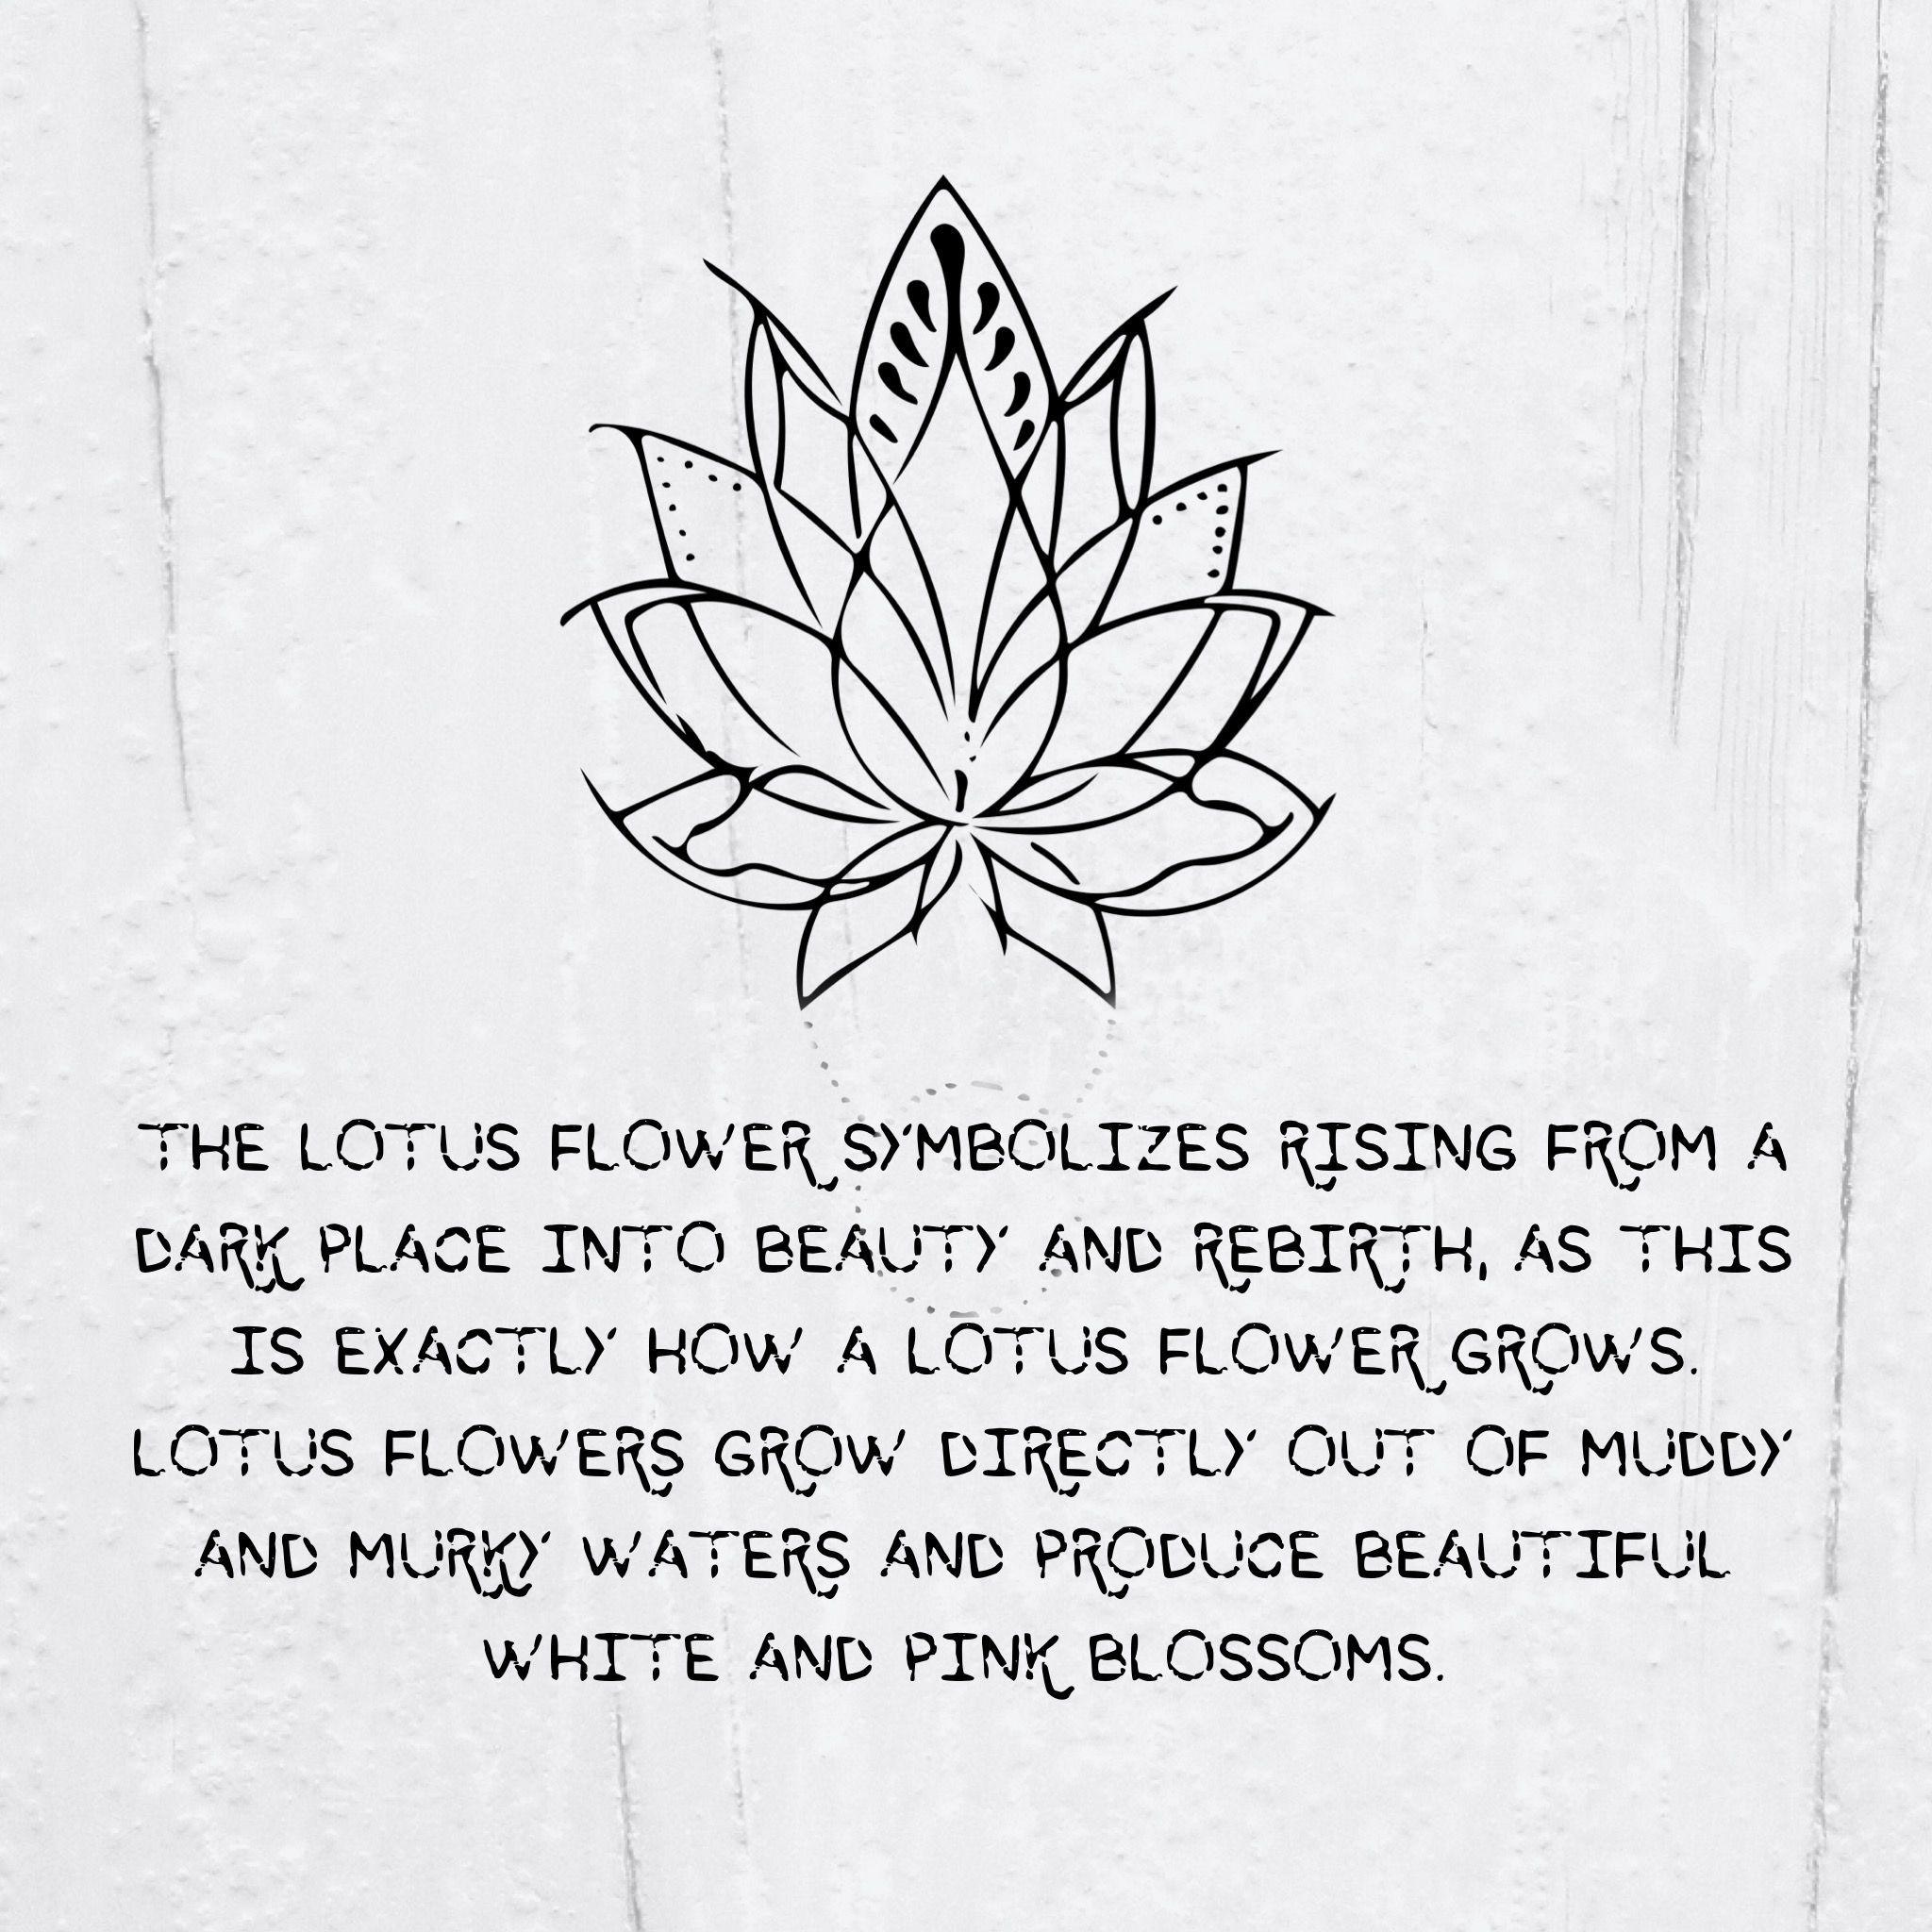 Pin By Tasha Adams On Feeling Flower Tattoo Meanings Lotus Flower Tattoo Meaning Tattoos With Meaning